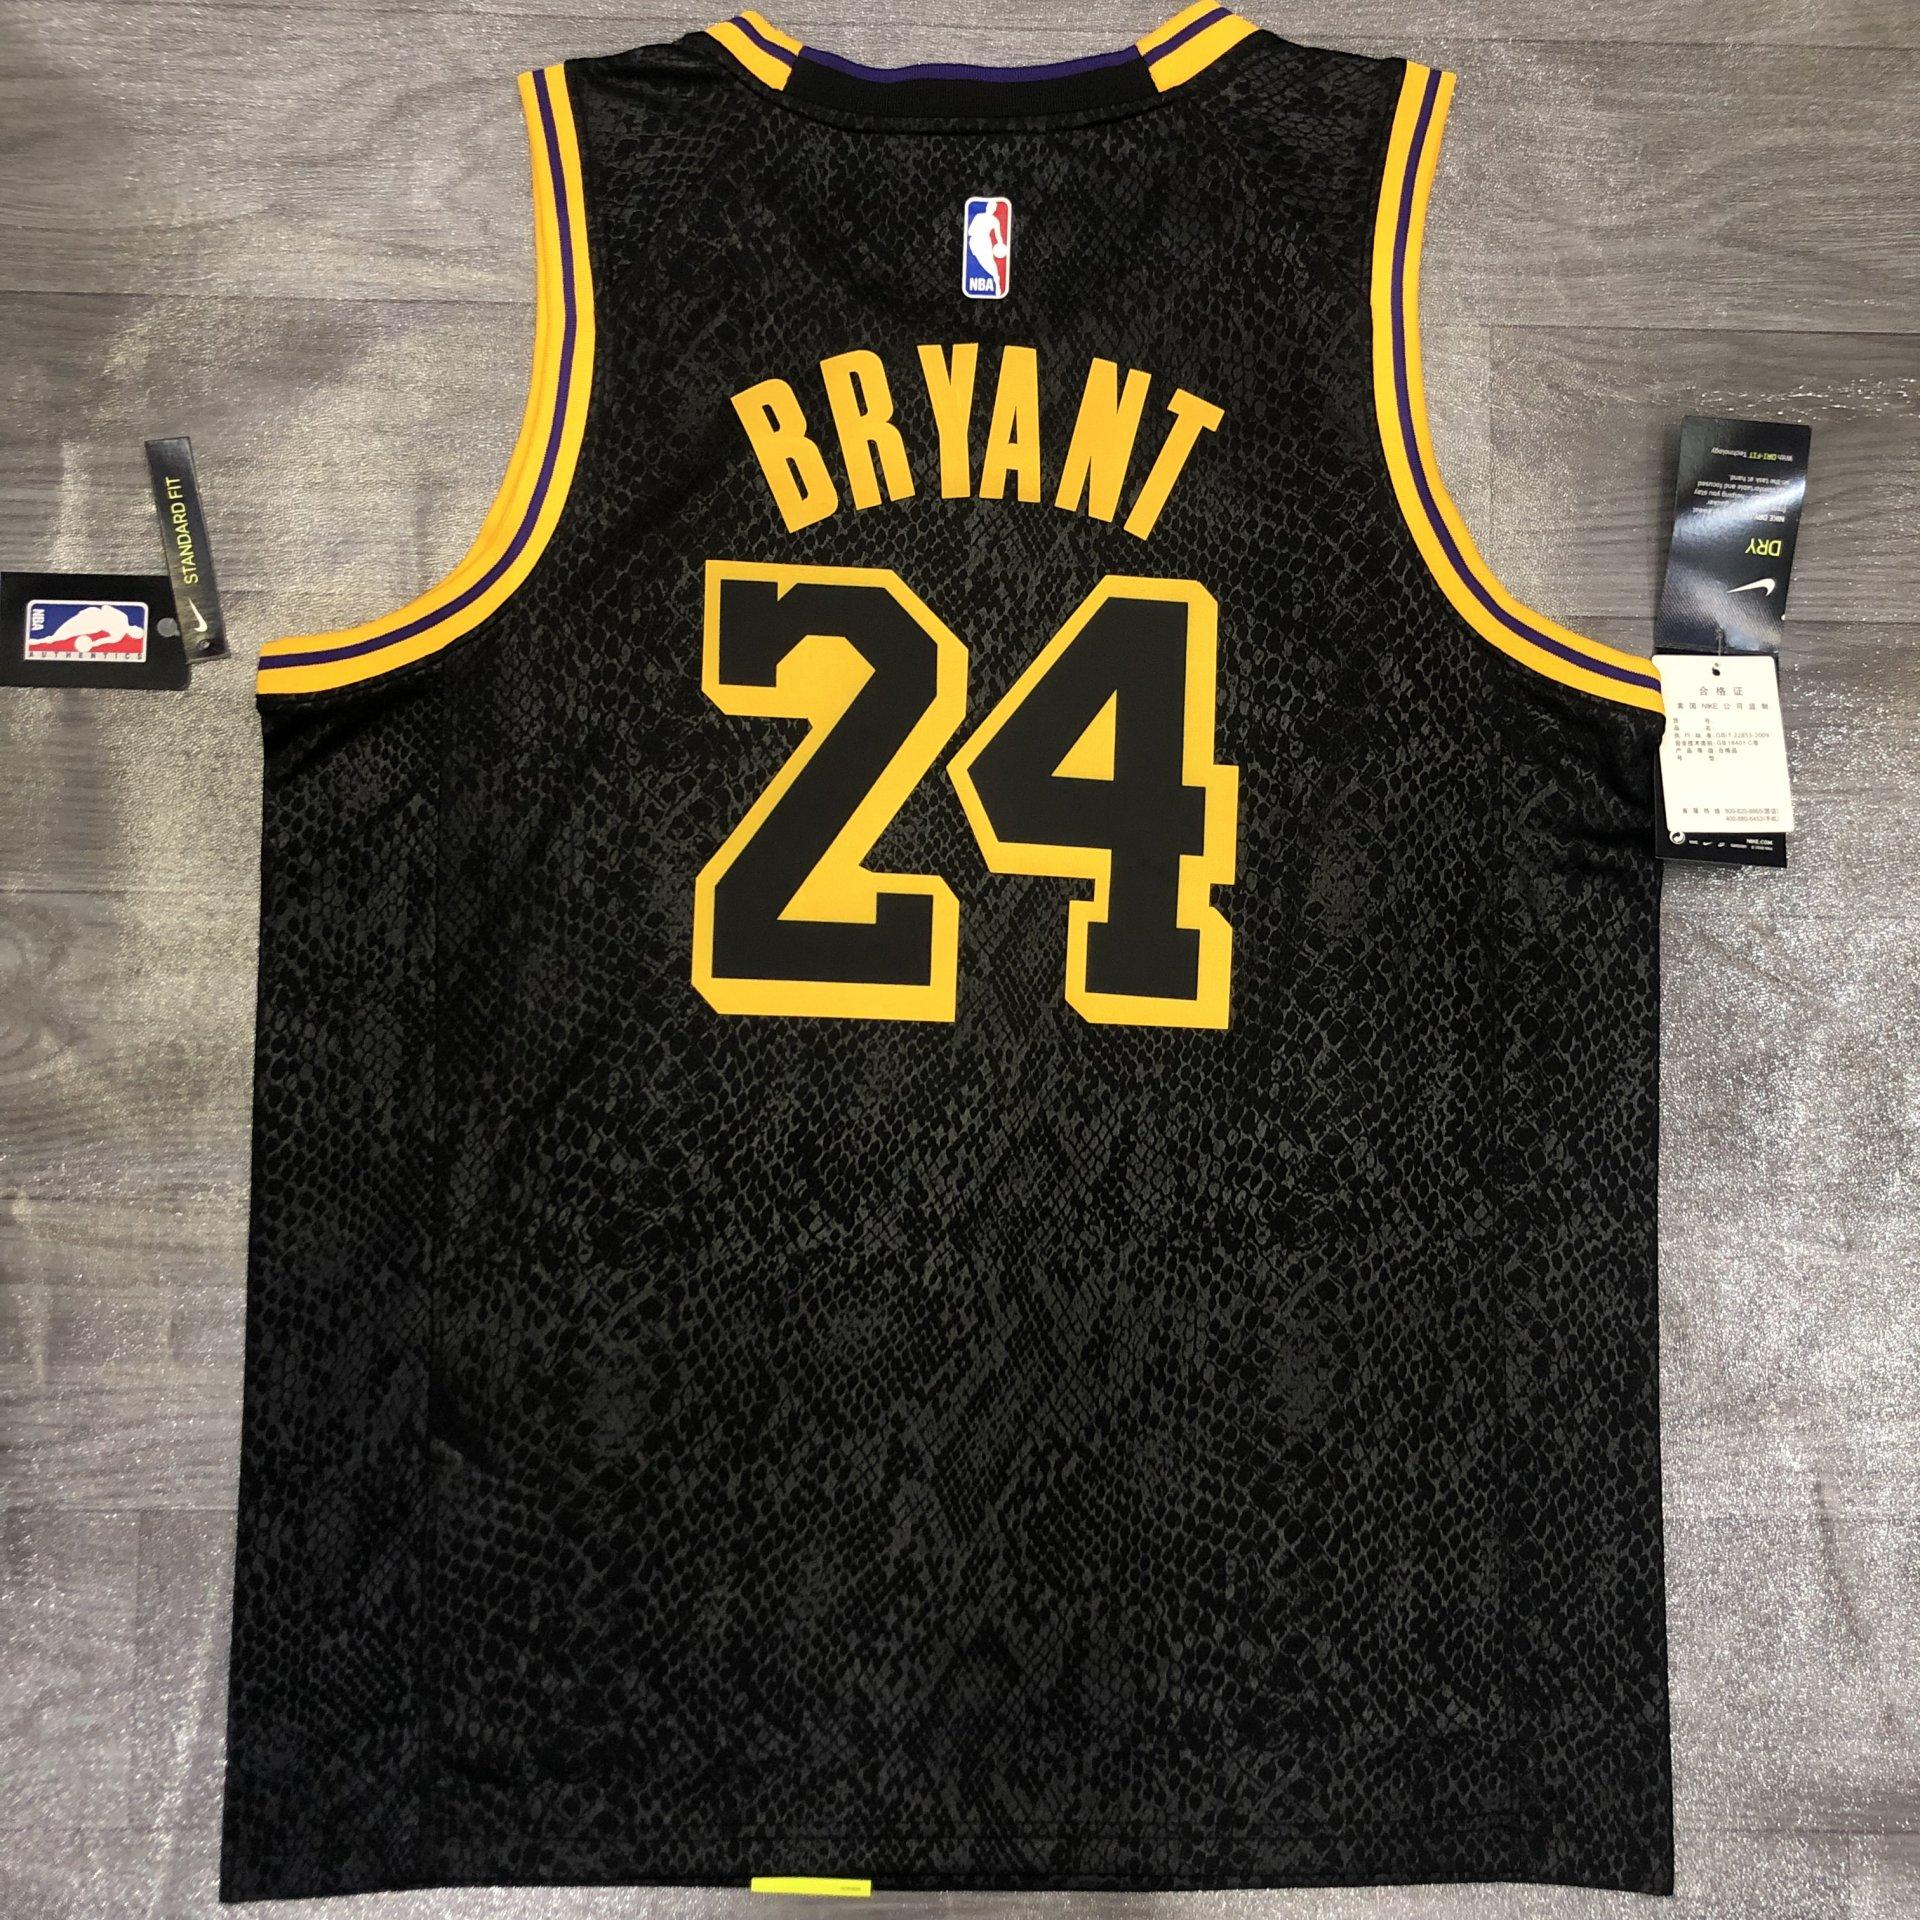 Kobe Bryant #8-24 - Los Angeles Lakers *RARE* Black Mamba ...